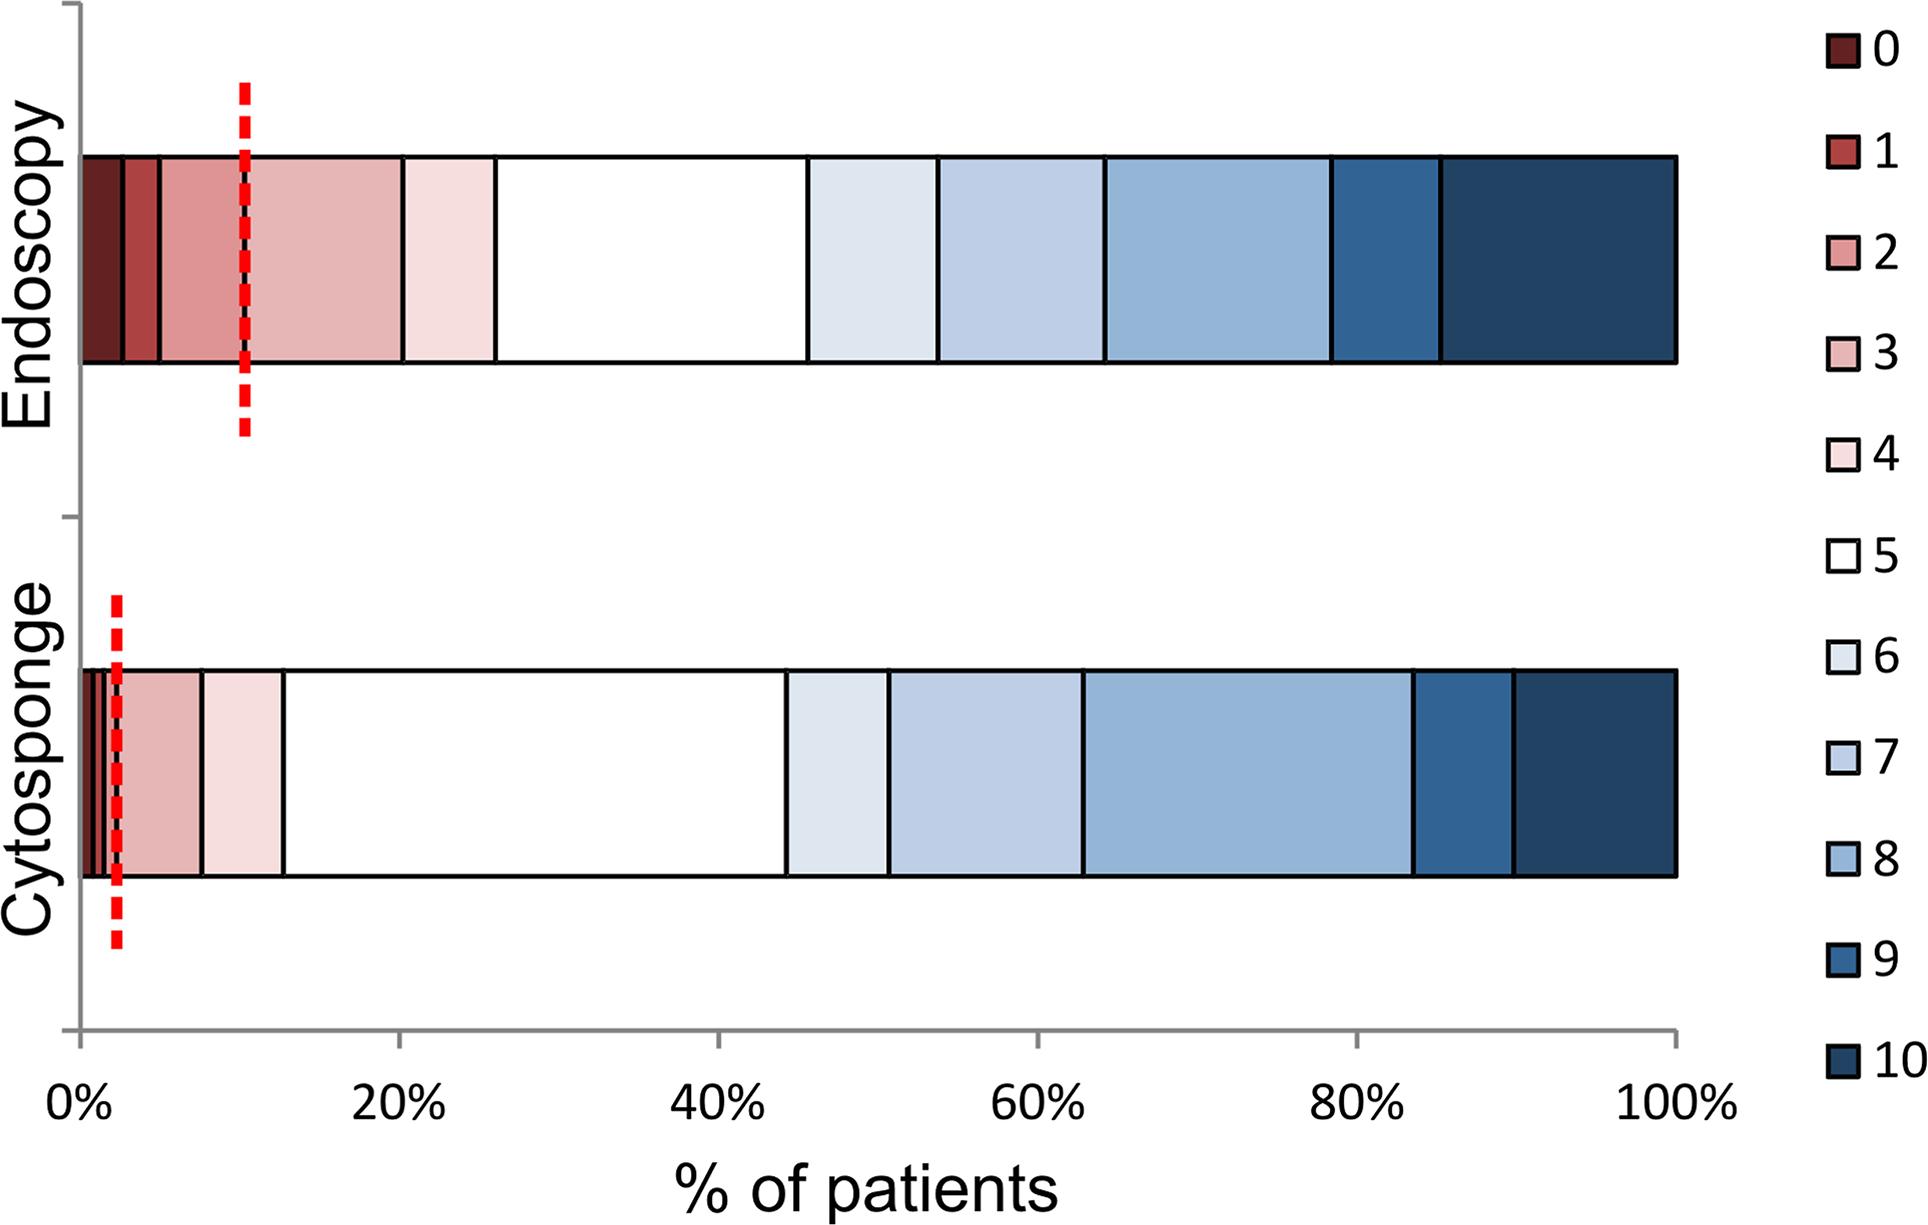 Acceptability of endoscopy and the Cytosponge test.